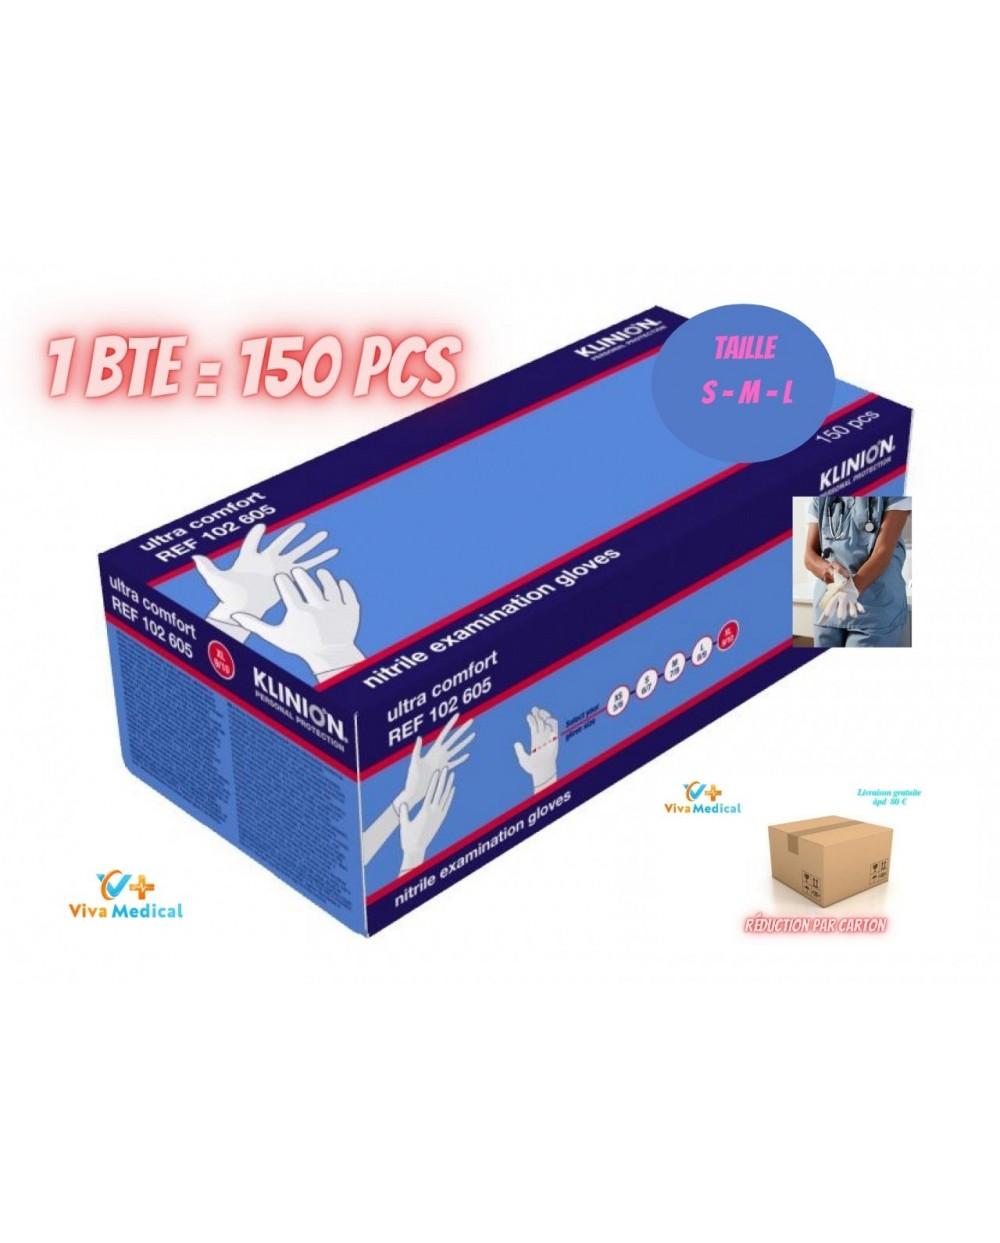 Klinion Gants Protection Nitrile Blanc - 150 pièces